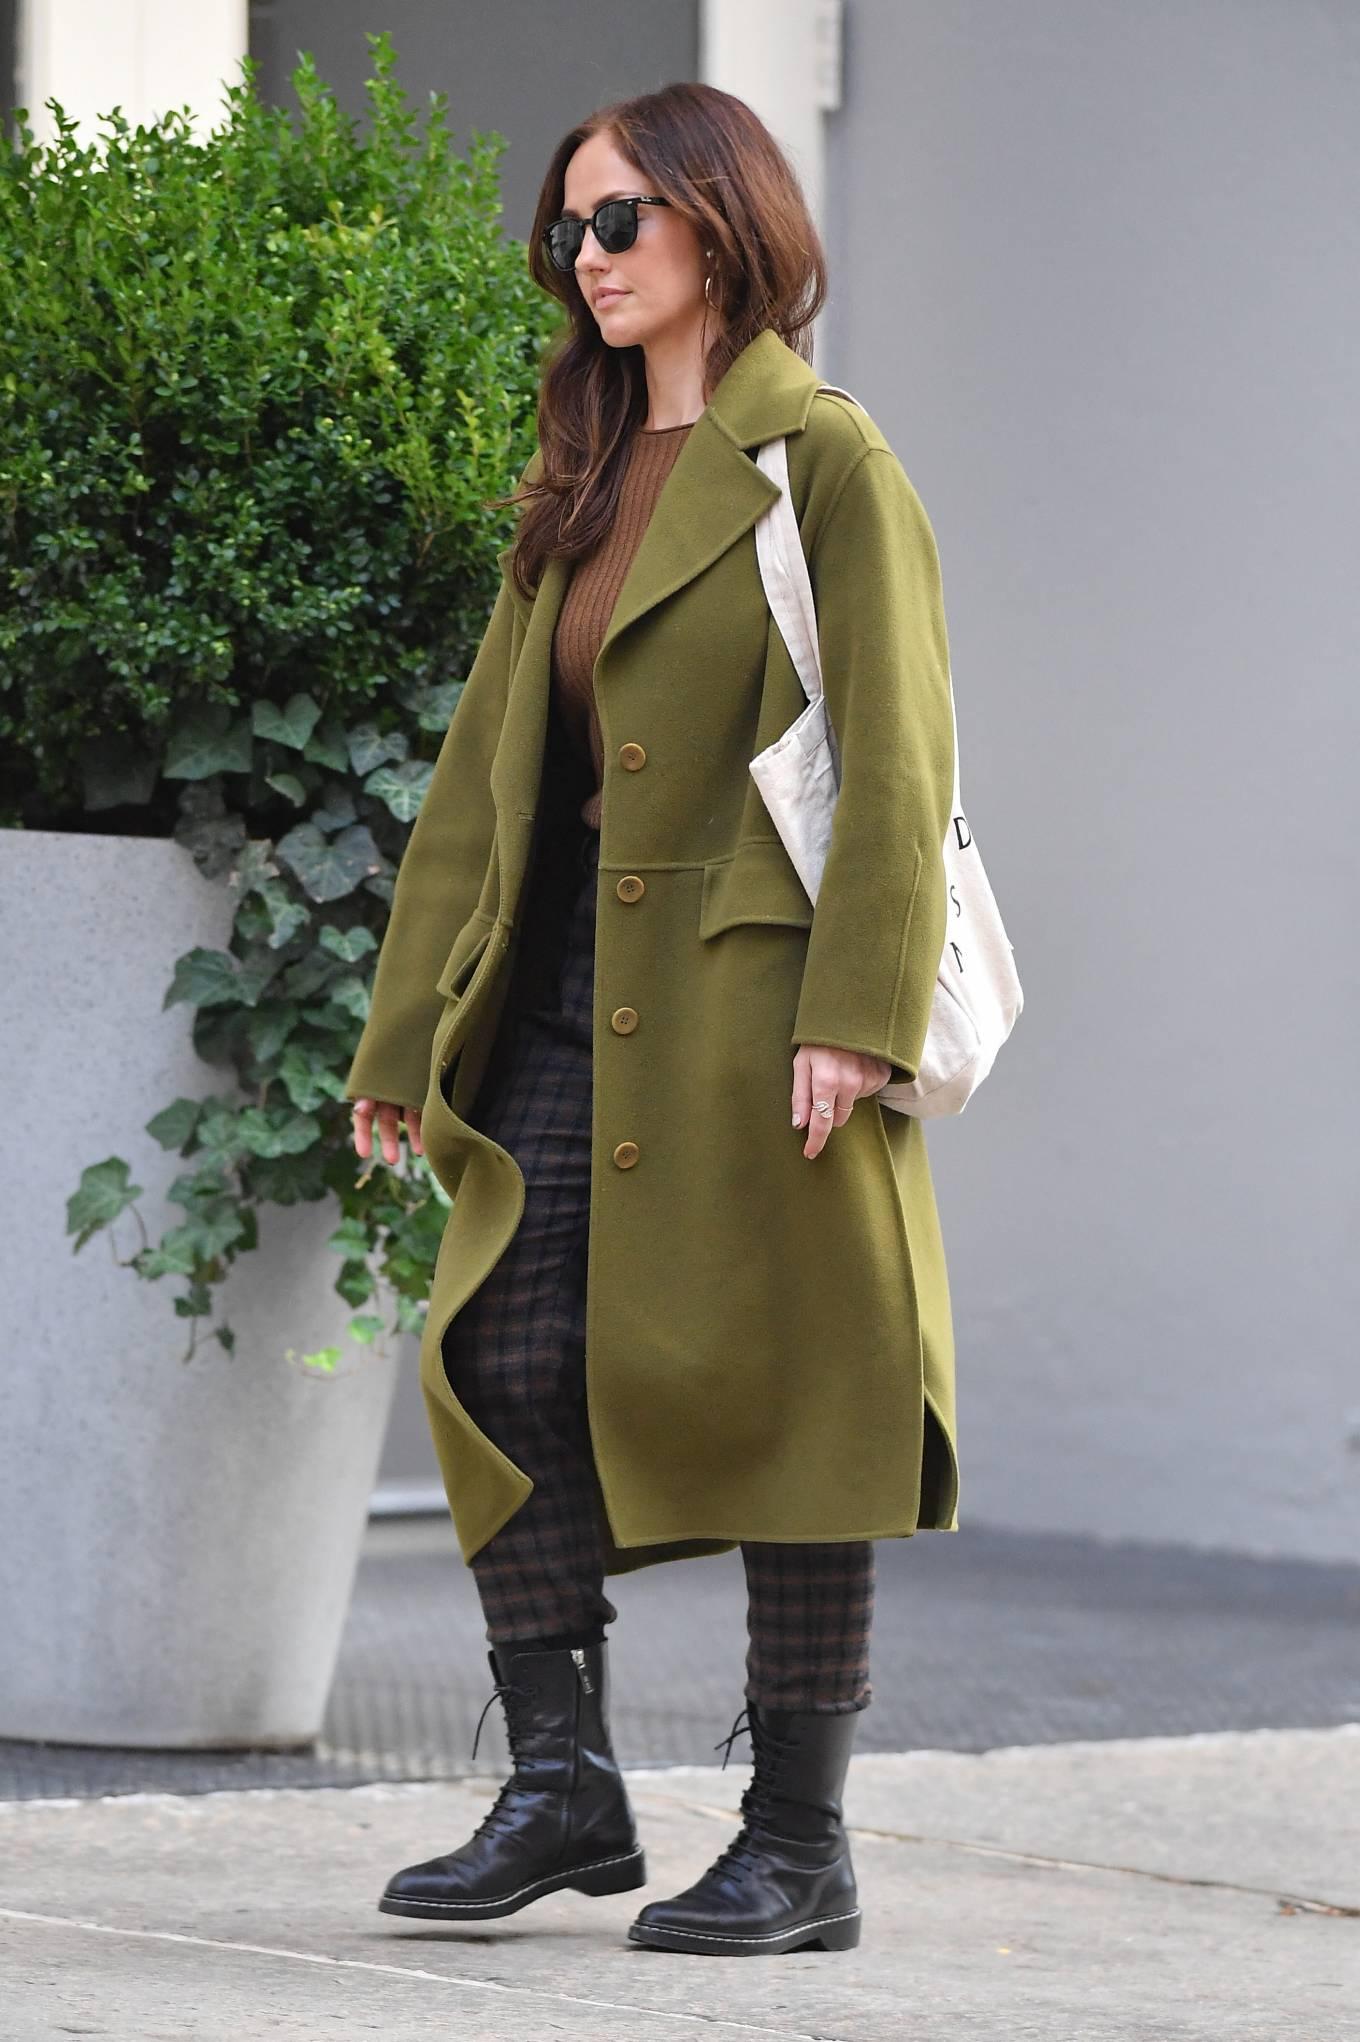 Minka Kelly 2021 : Minka Kelly – In olive green runs errands in New York-26